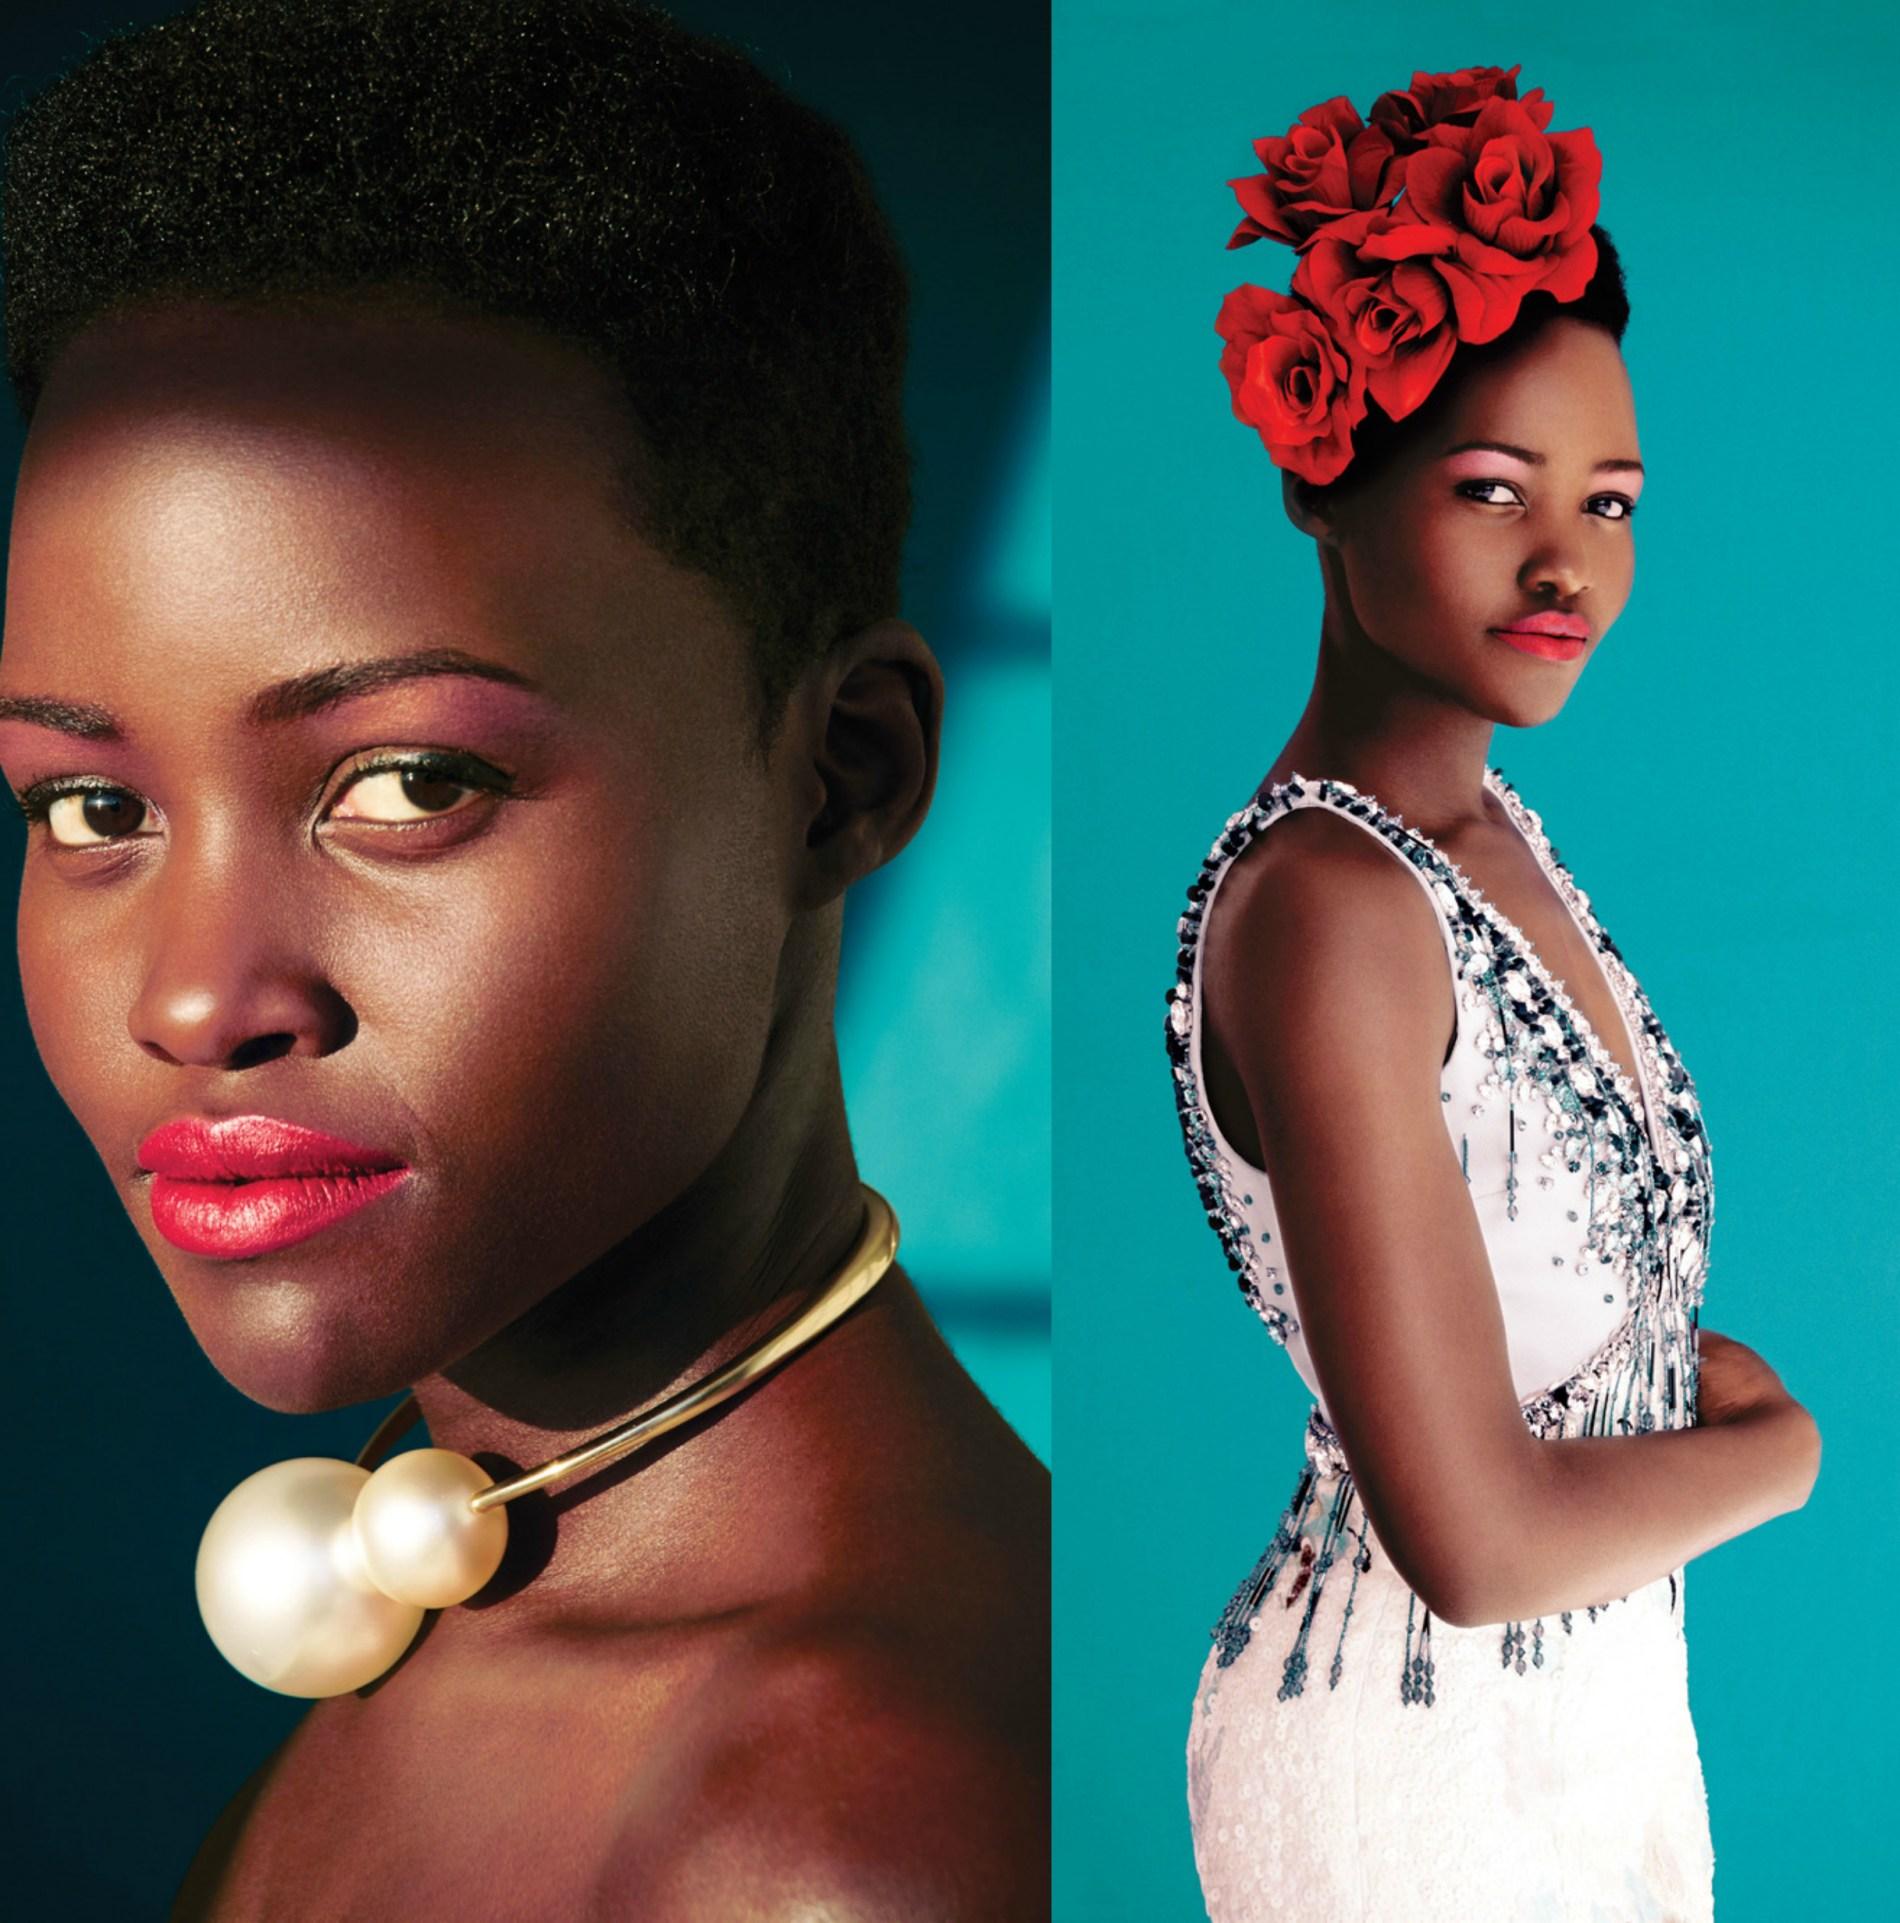 lupita nyongo'o fashion it girl for new york magazine